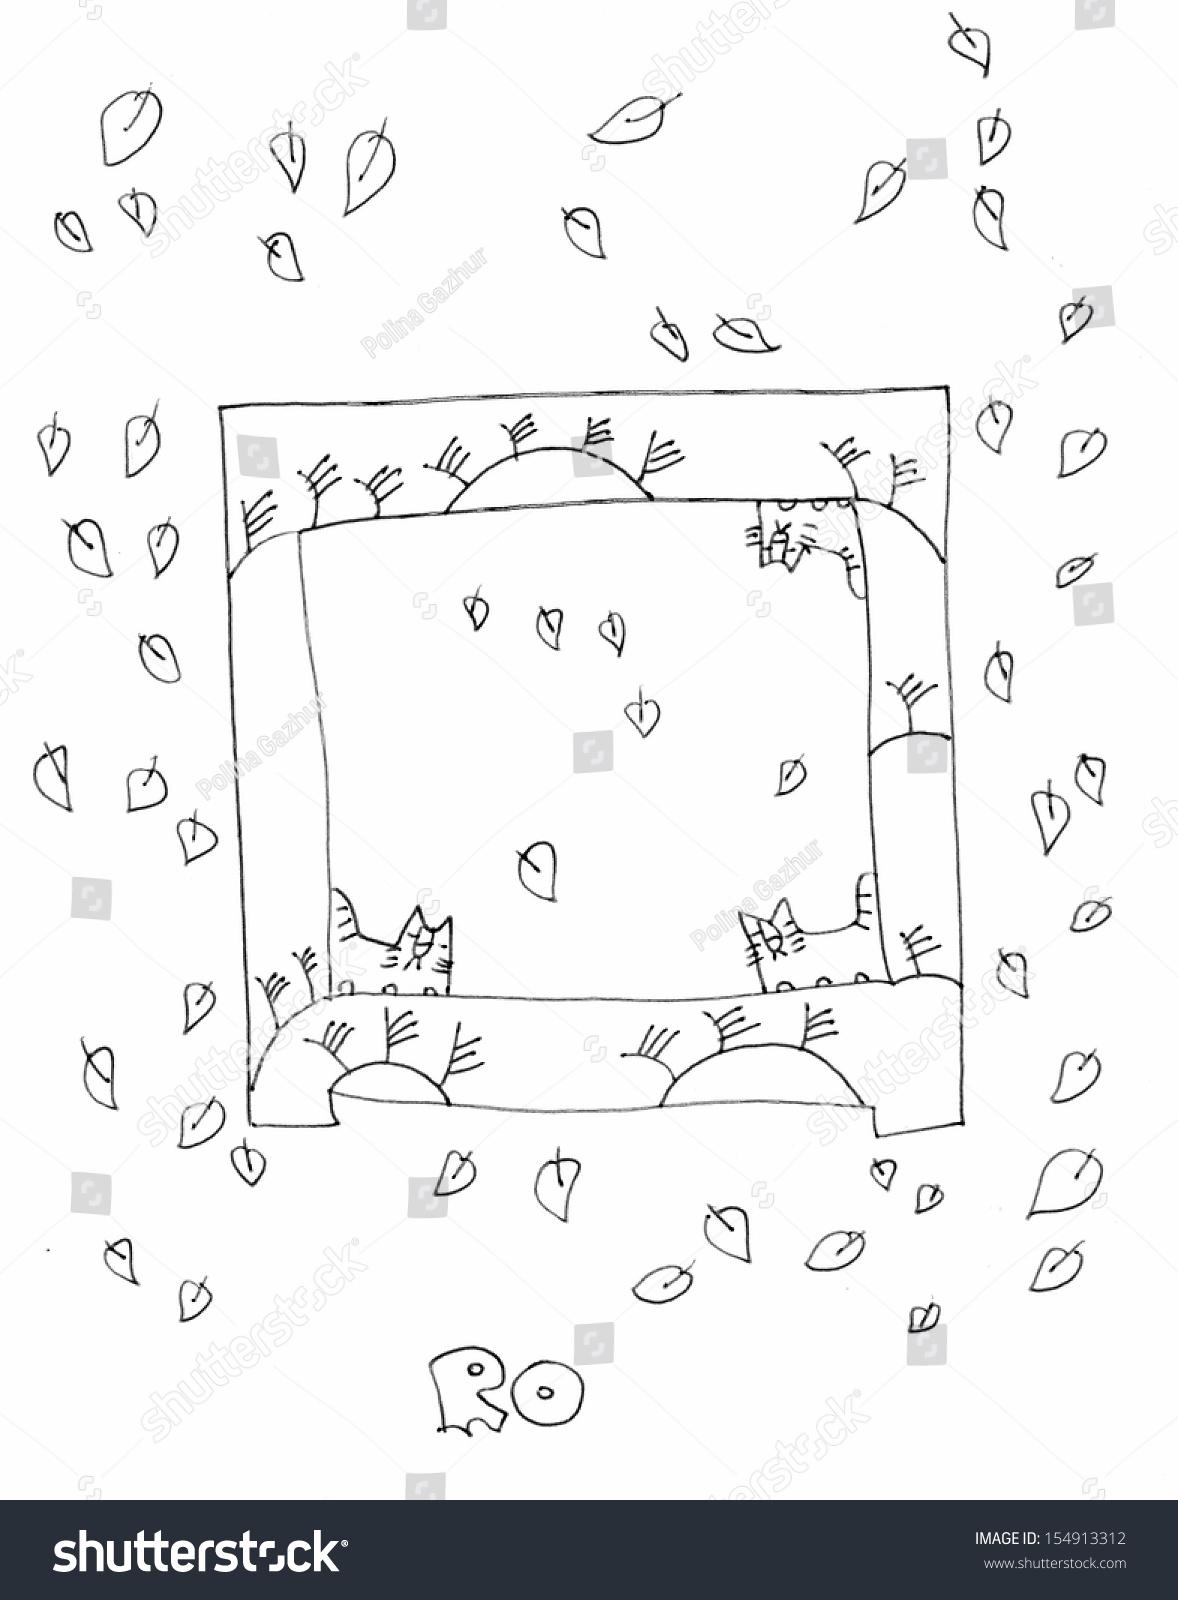 Sketched Illustration Japanese Letter Katakana Trees Stock